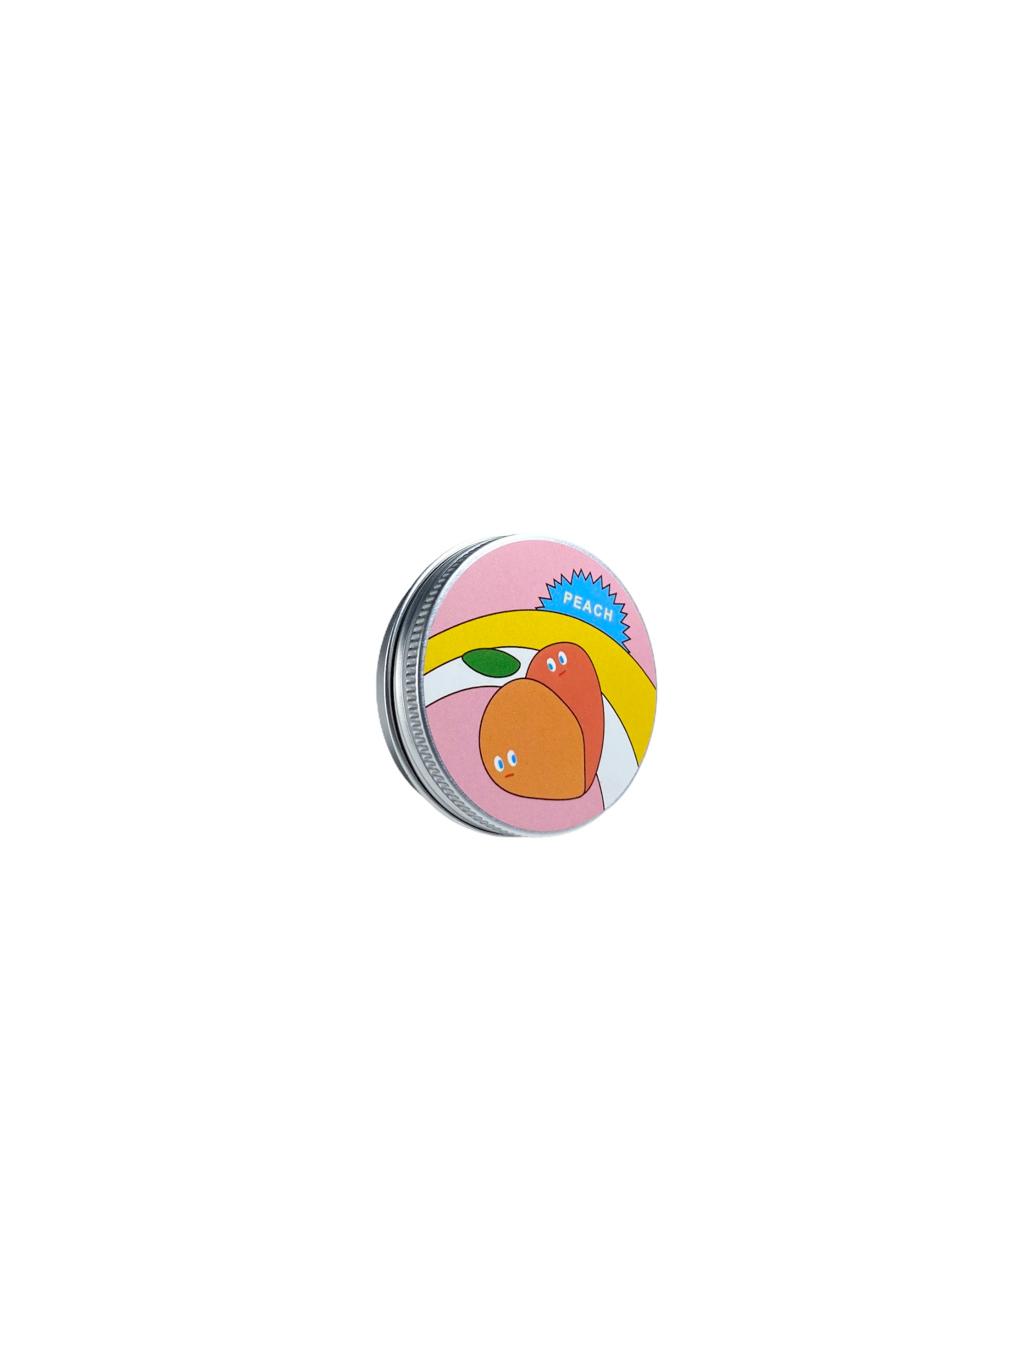 Candle - Peach